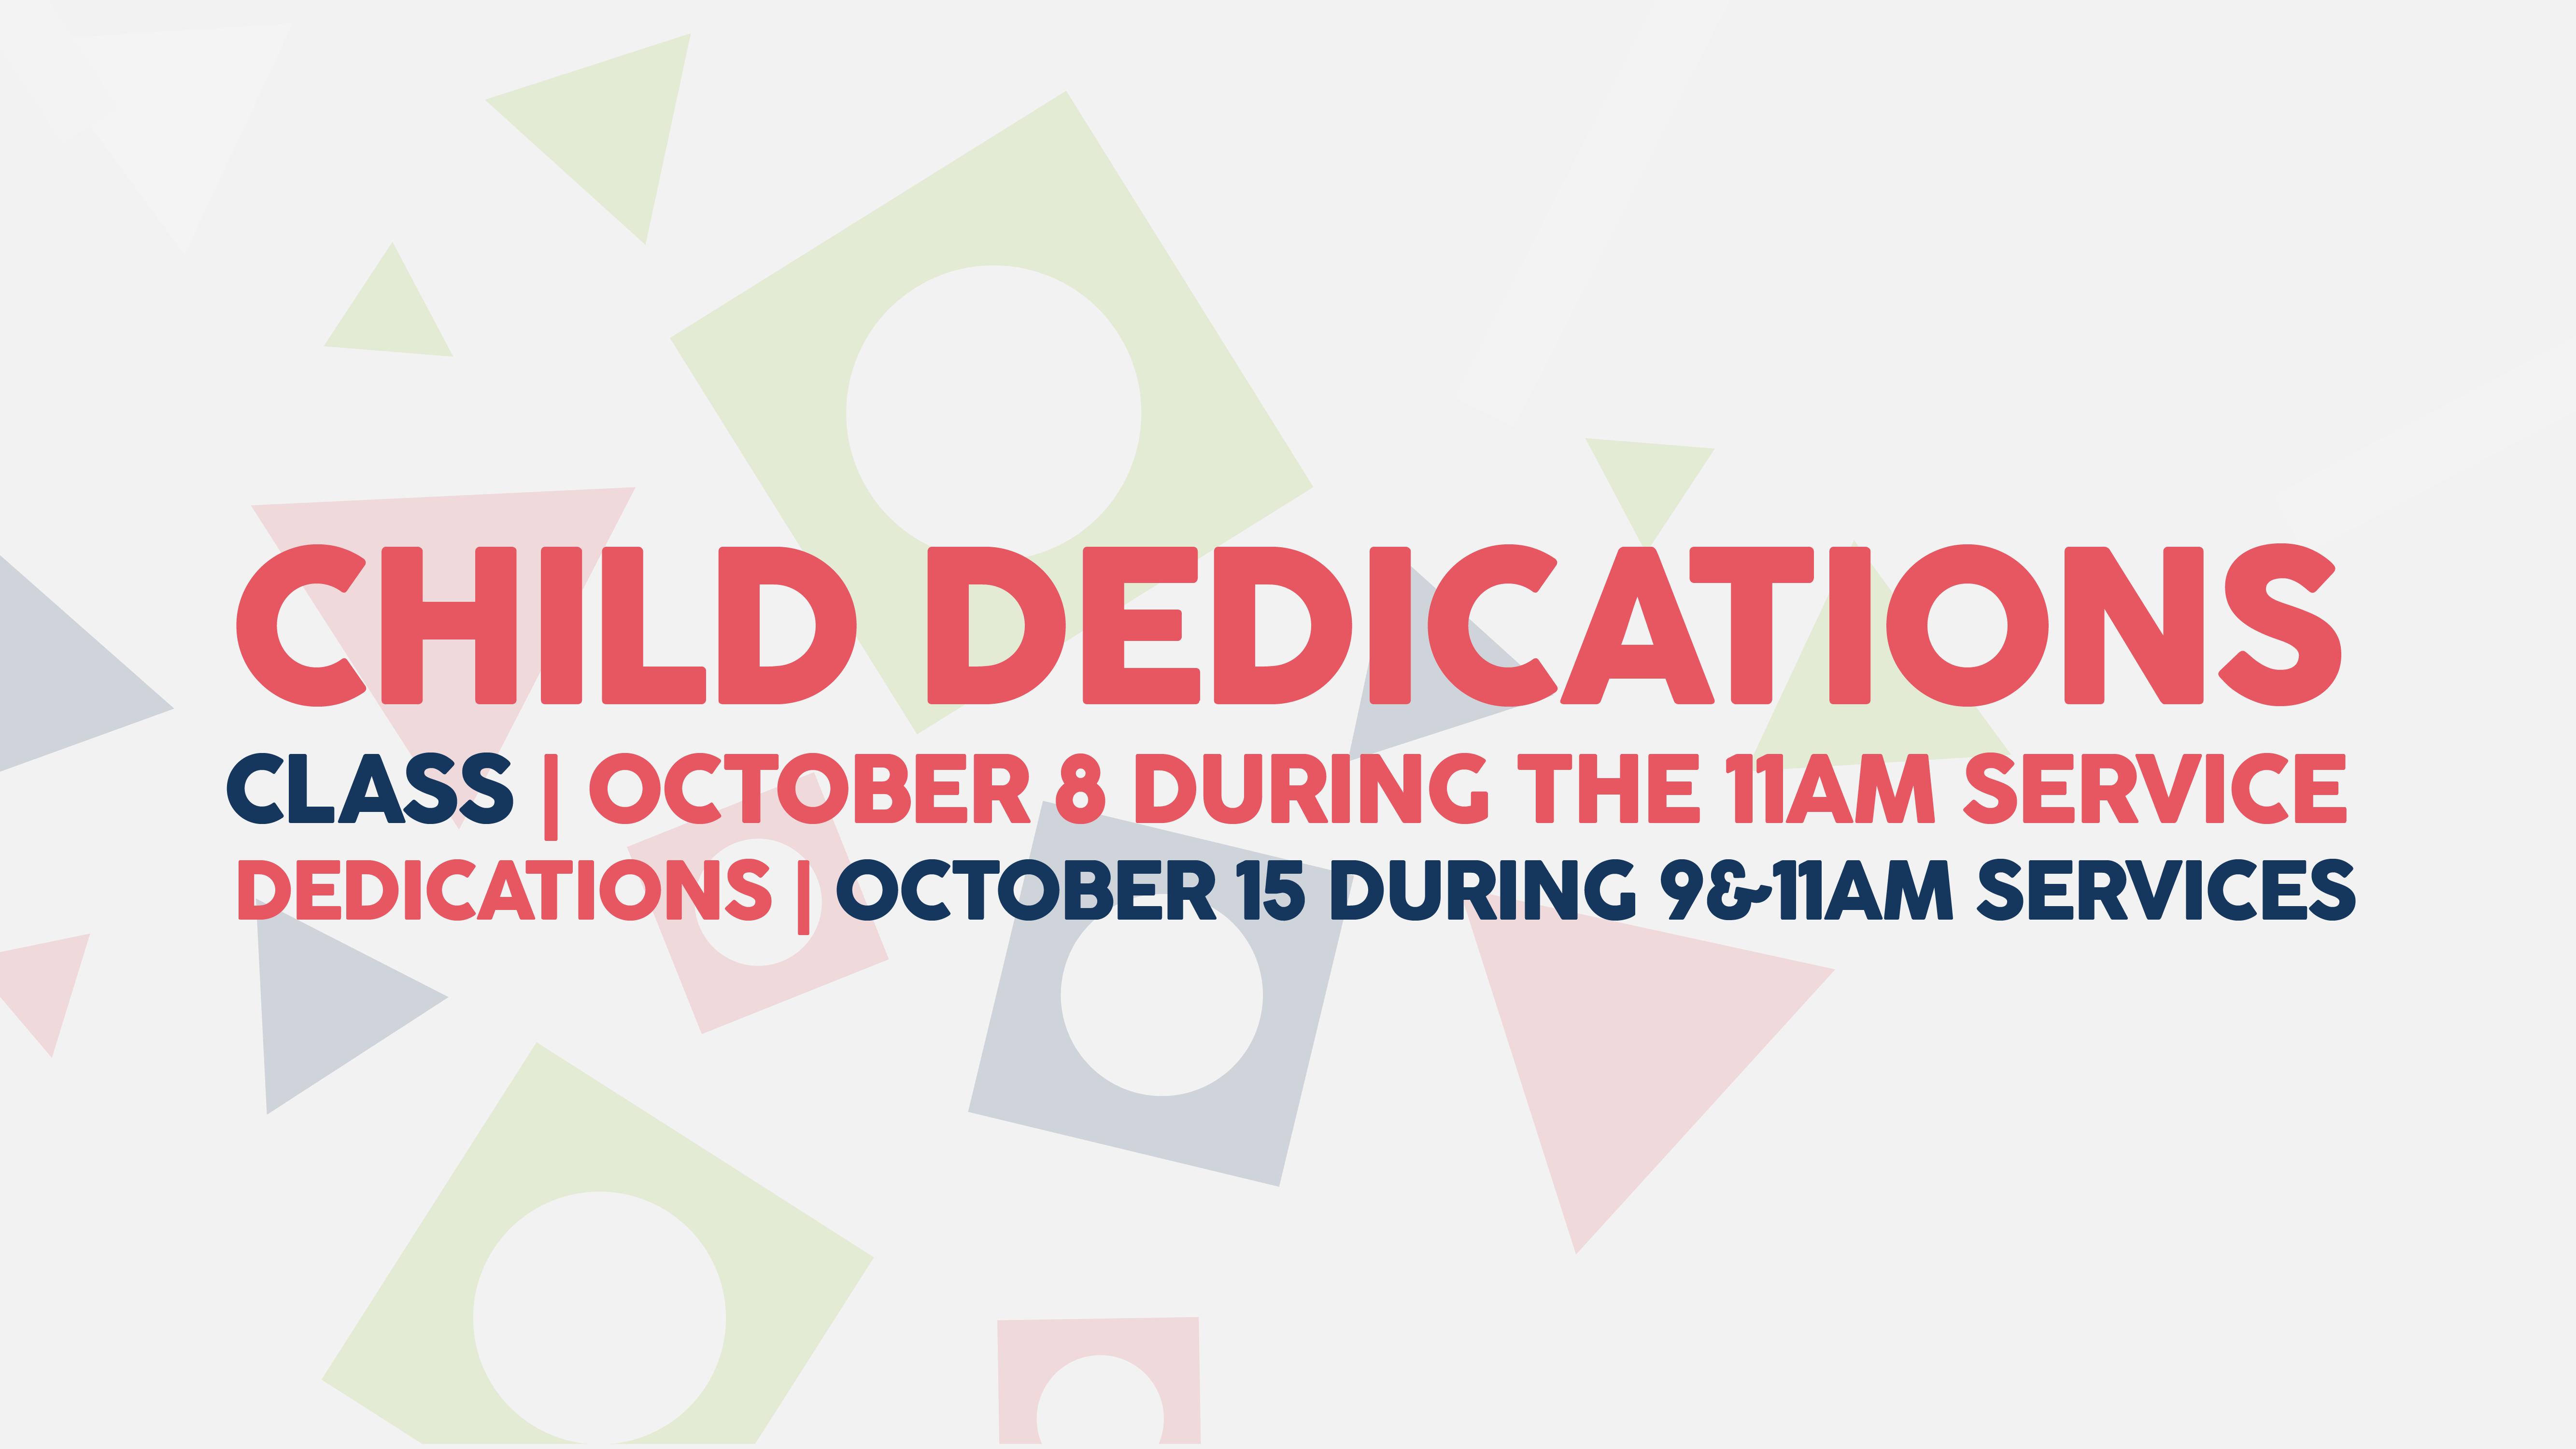 Child dedications 01